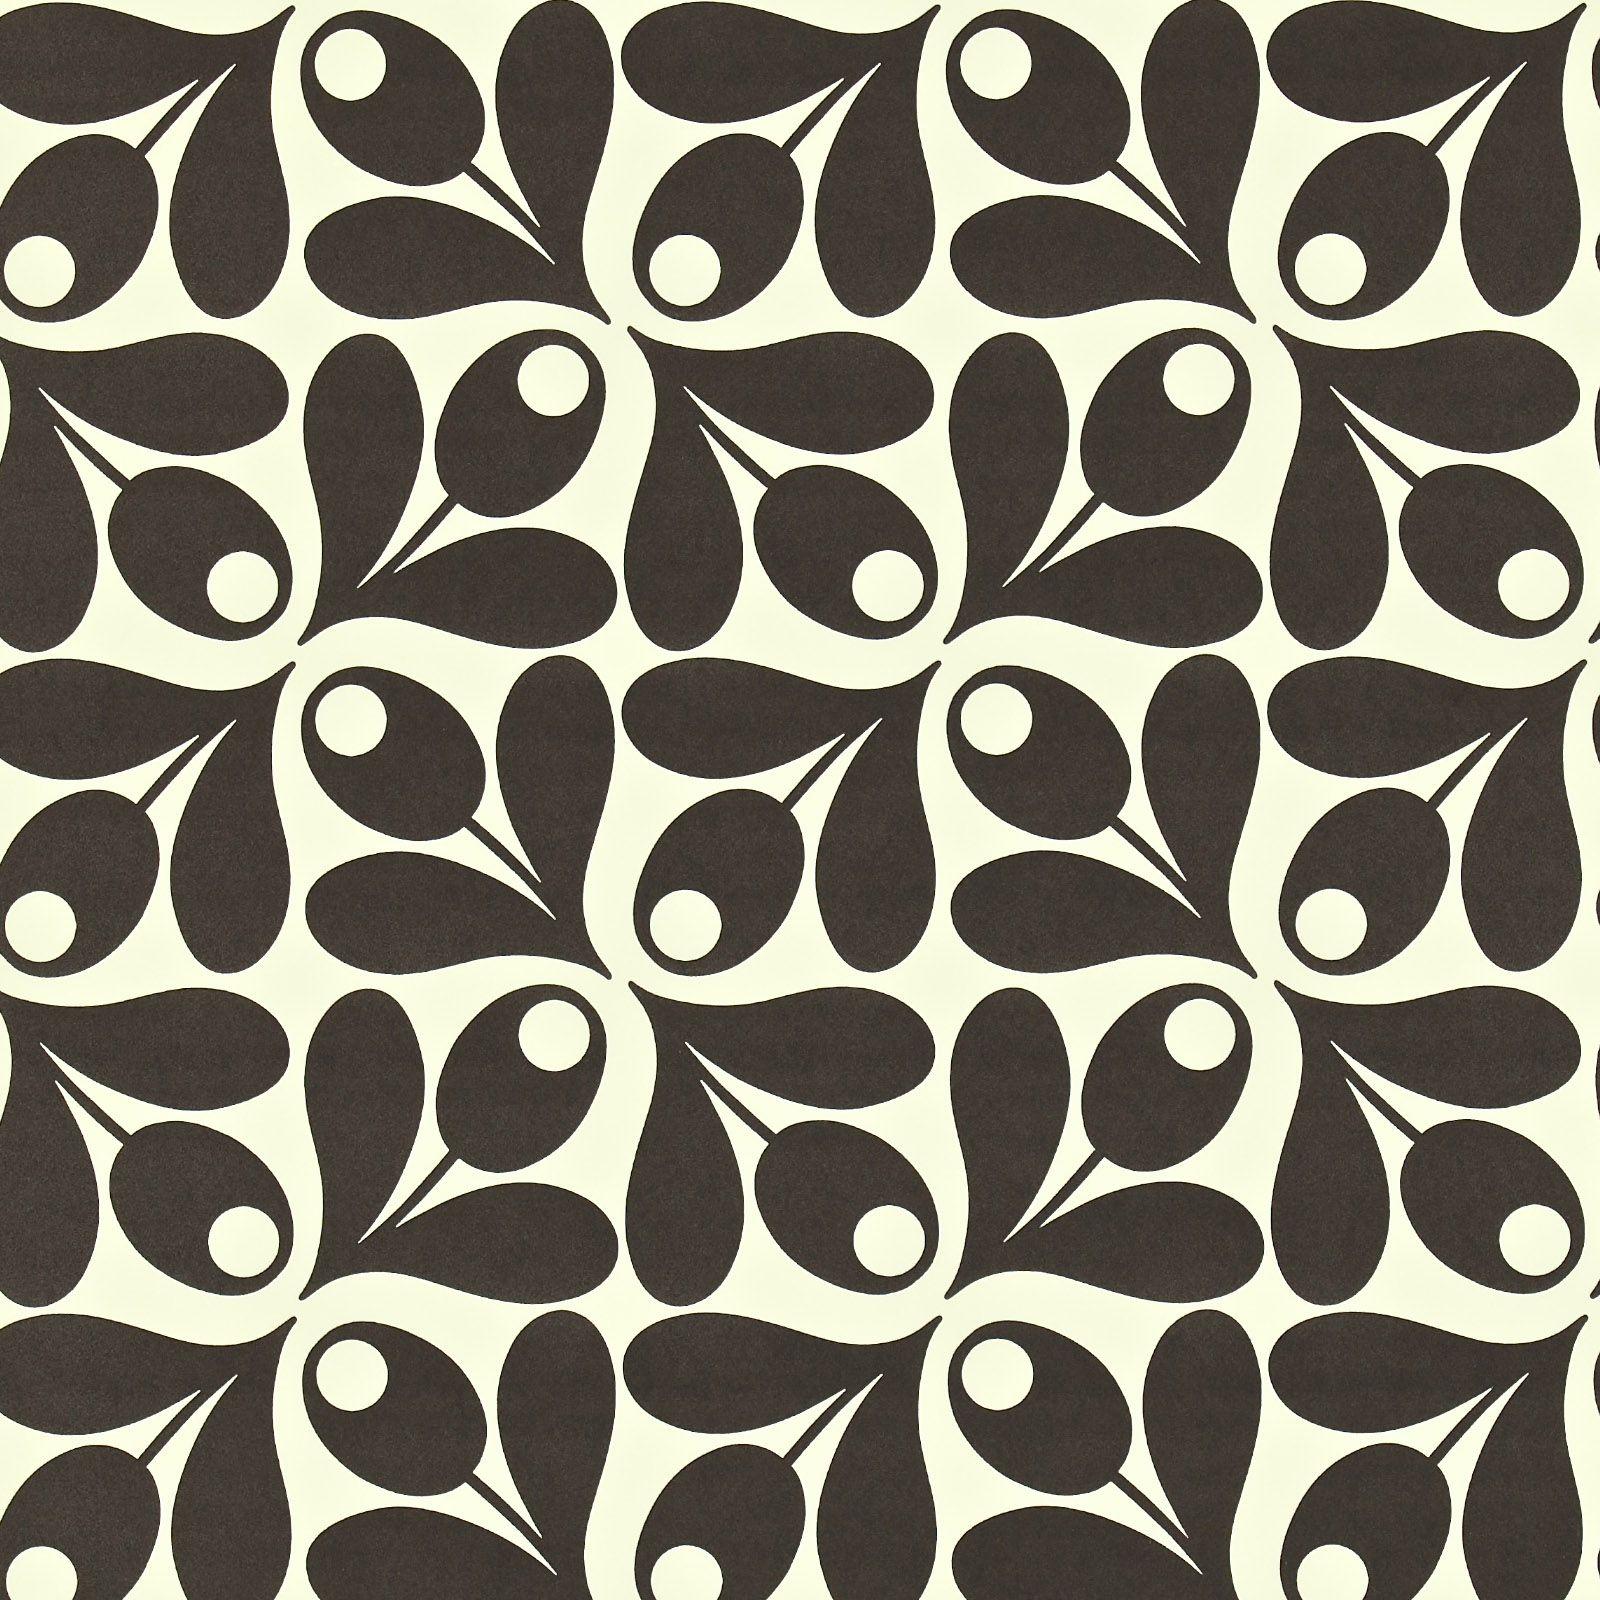 Orla kiely orla kiely small acorn cup print wallpaper hanging